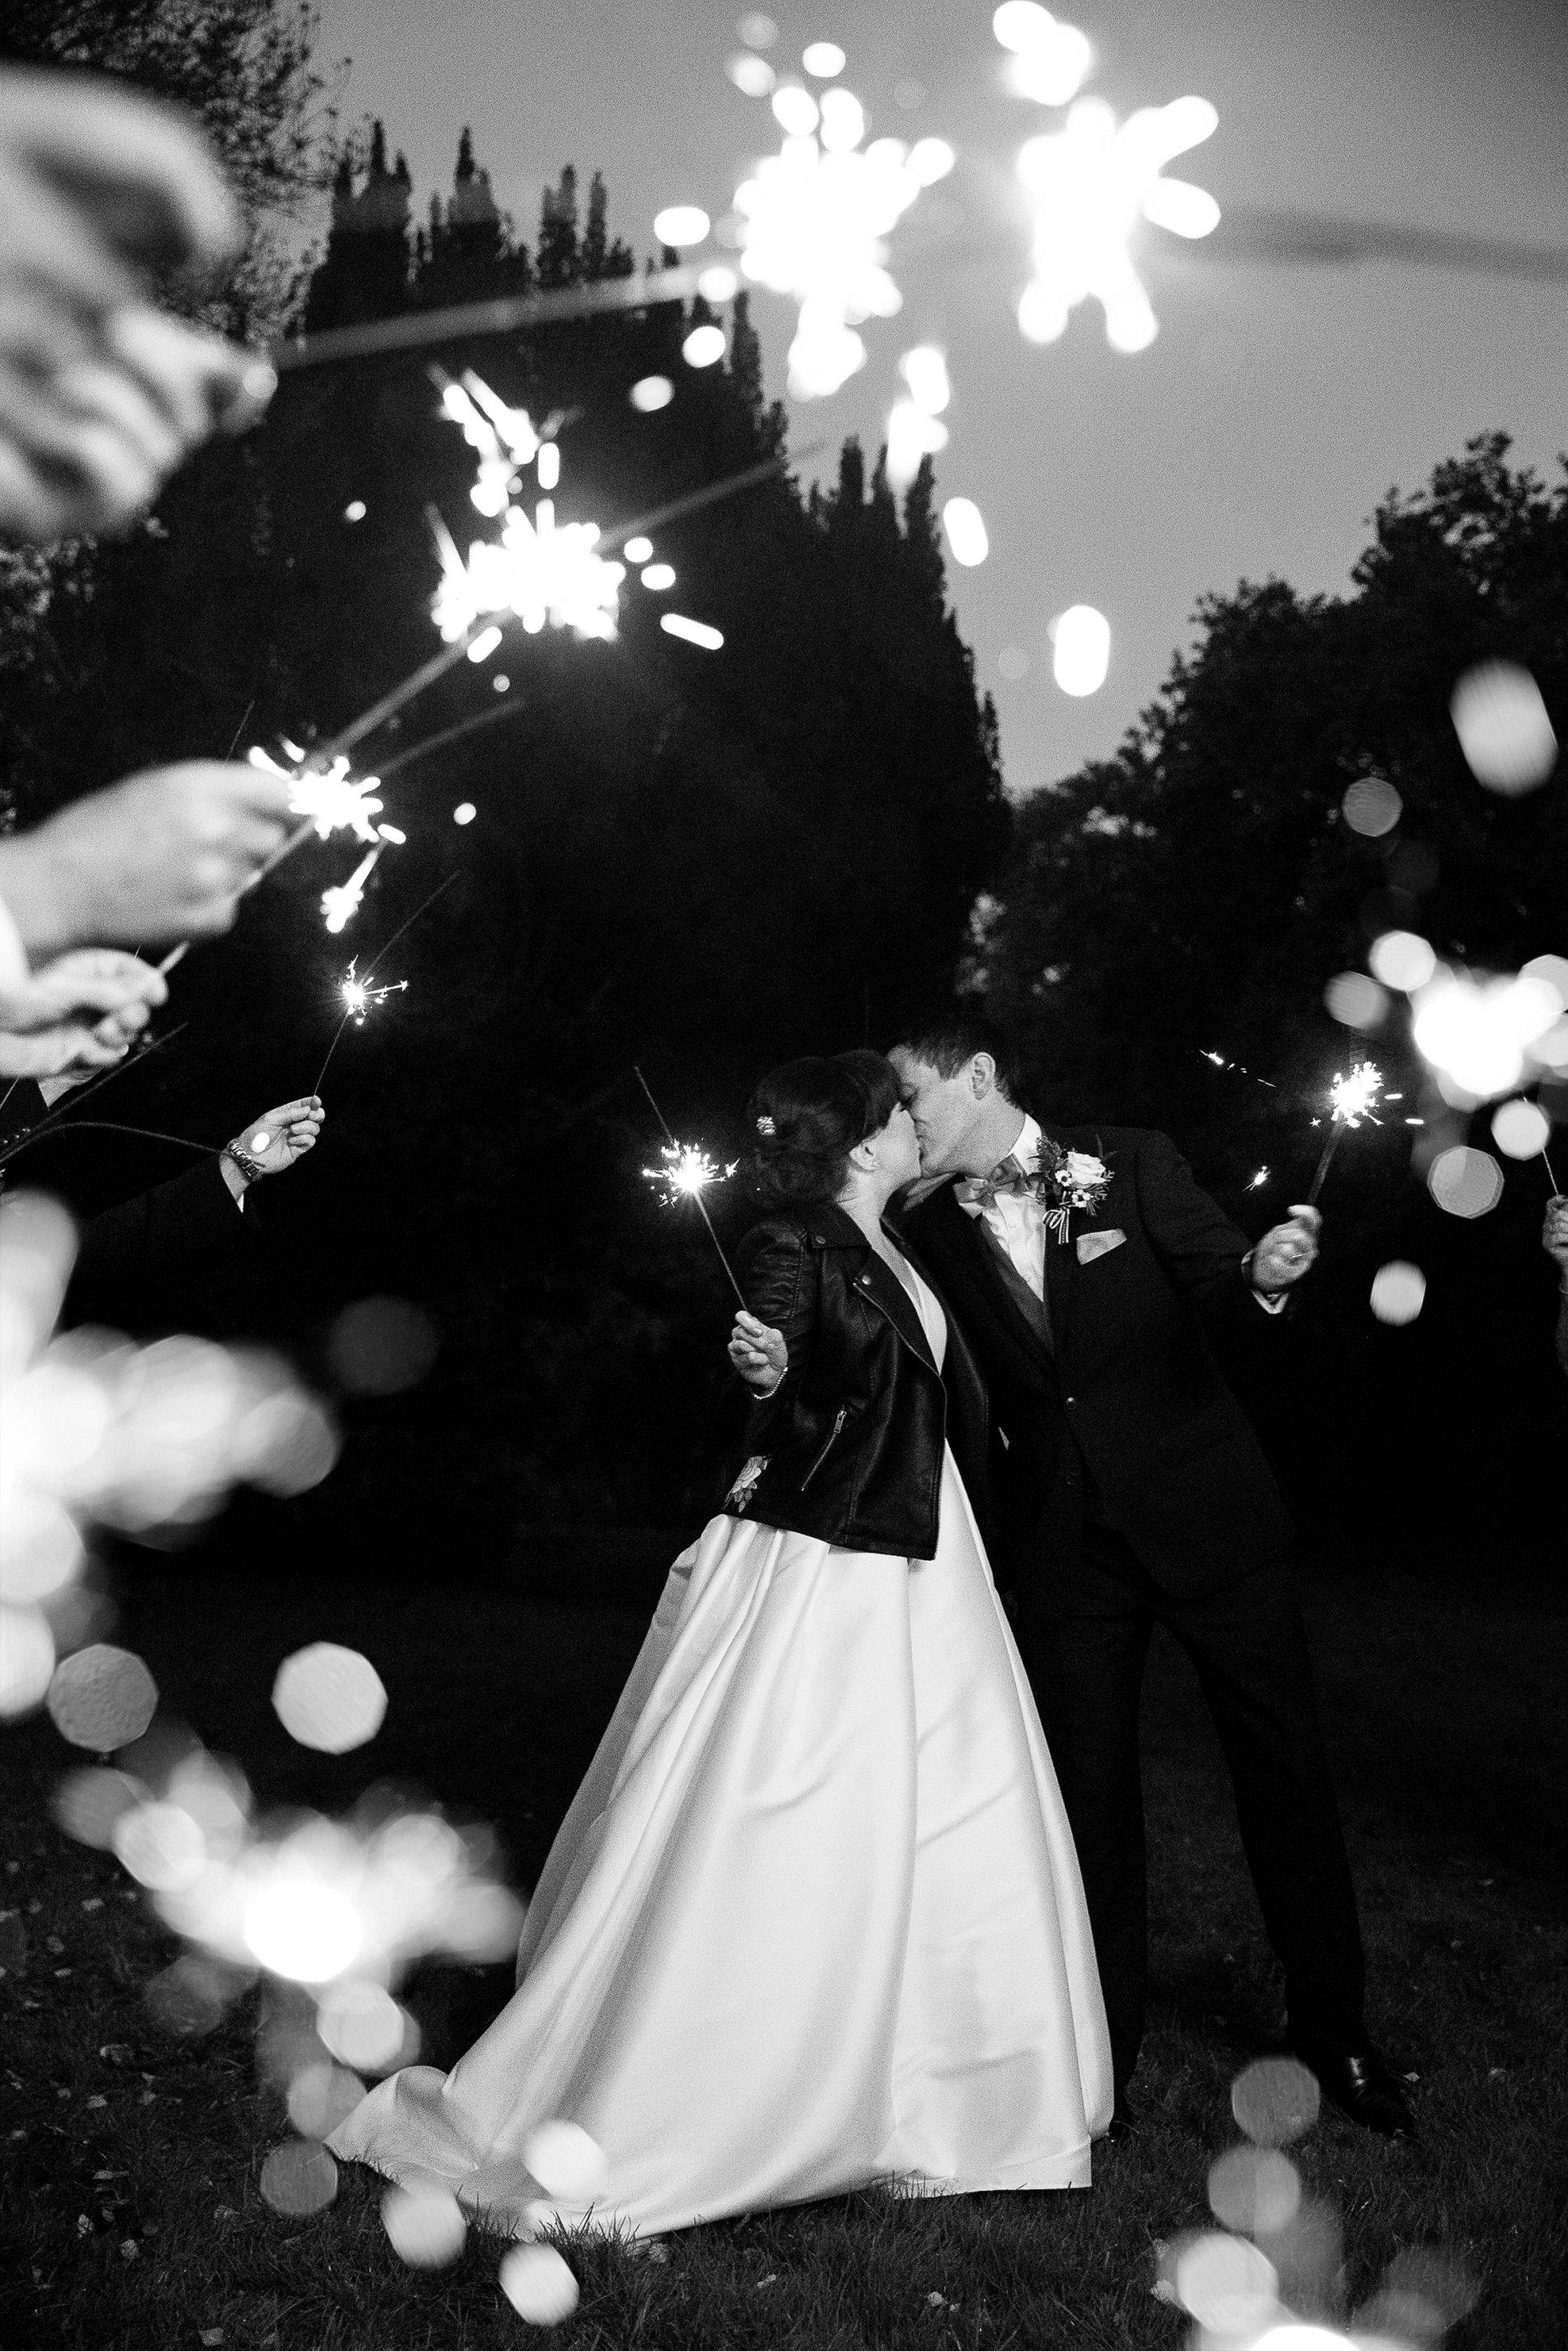 An Elegant White Wedding at Thicket Priory (c) Carla Whittingham Photography (89)